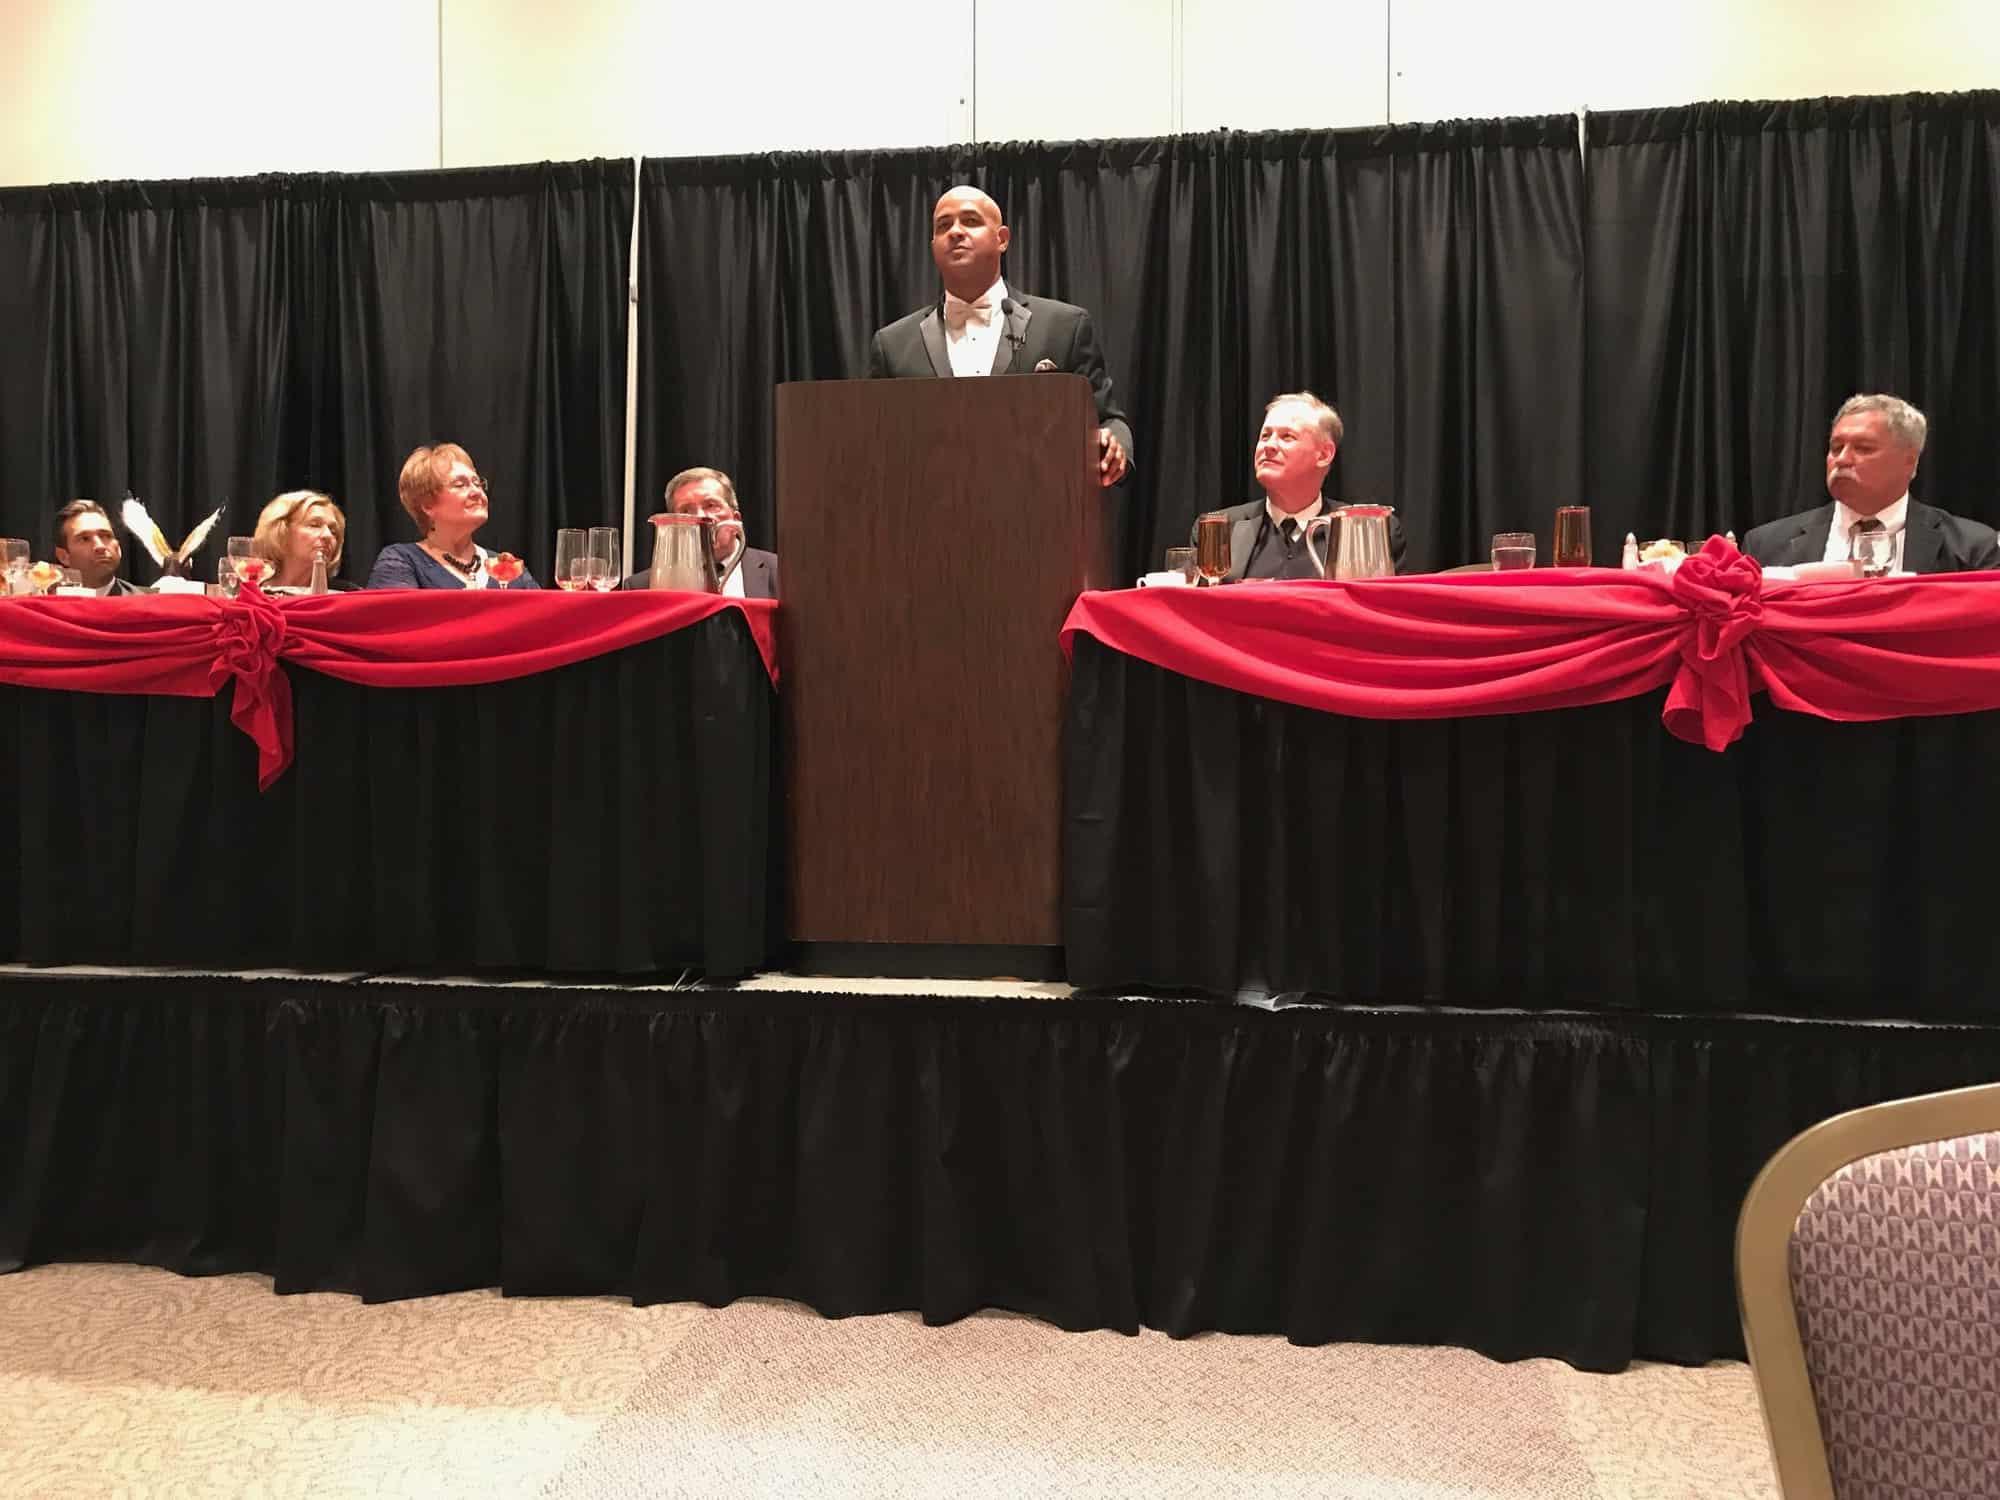 Roberto Clemente Jr at podium